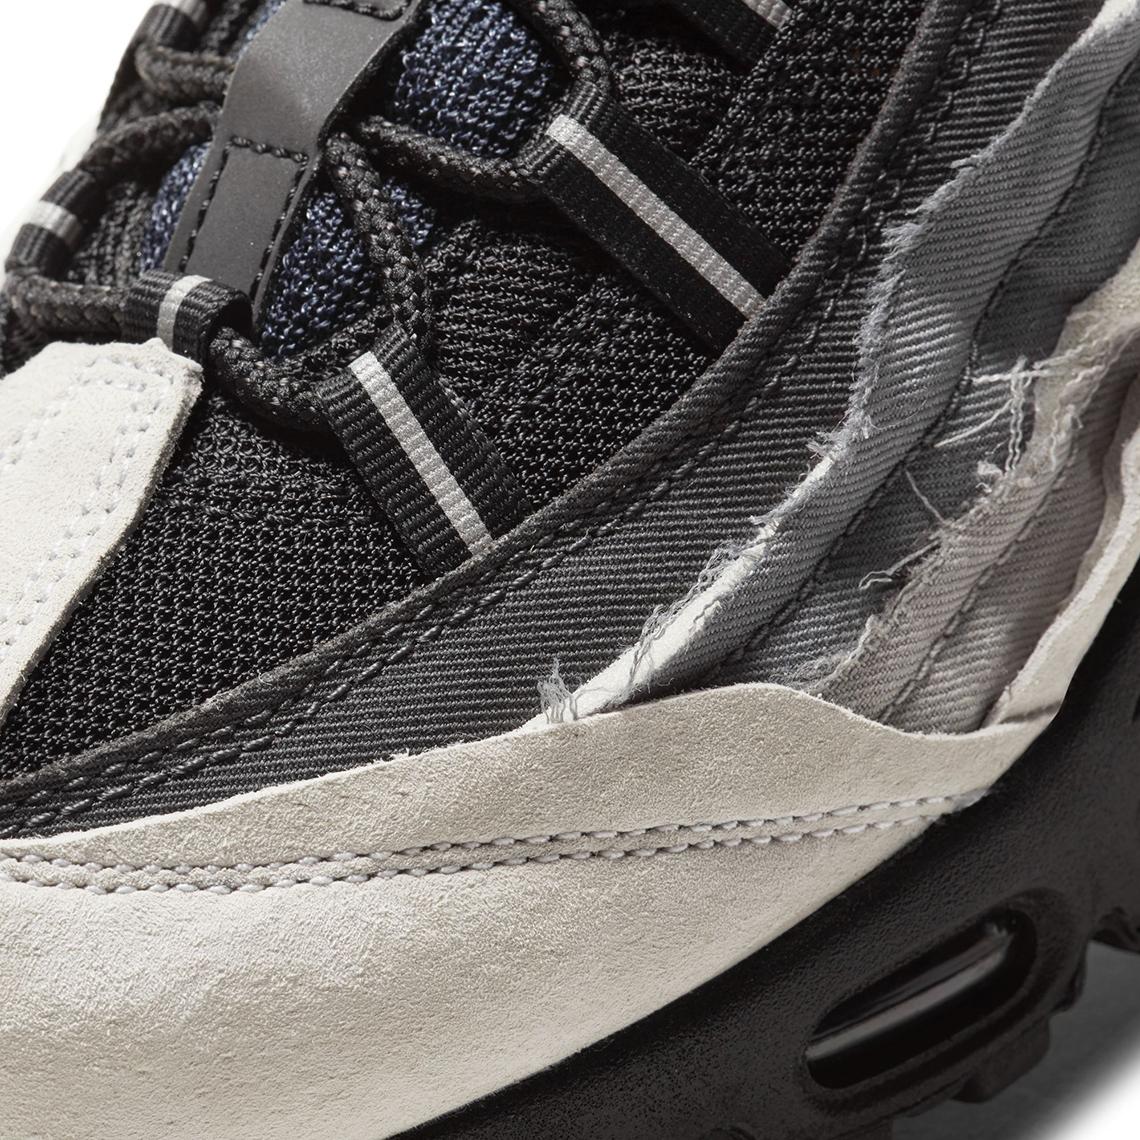 Comme des Garçons x Nike Air Max 95